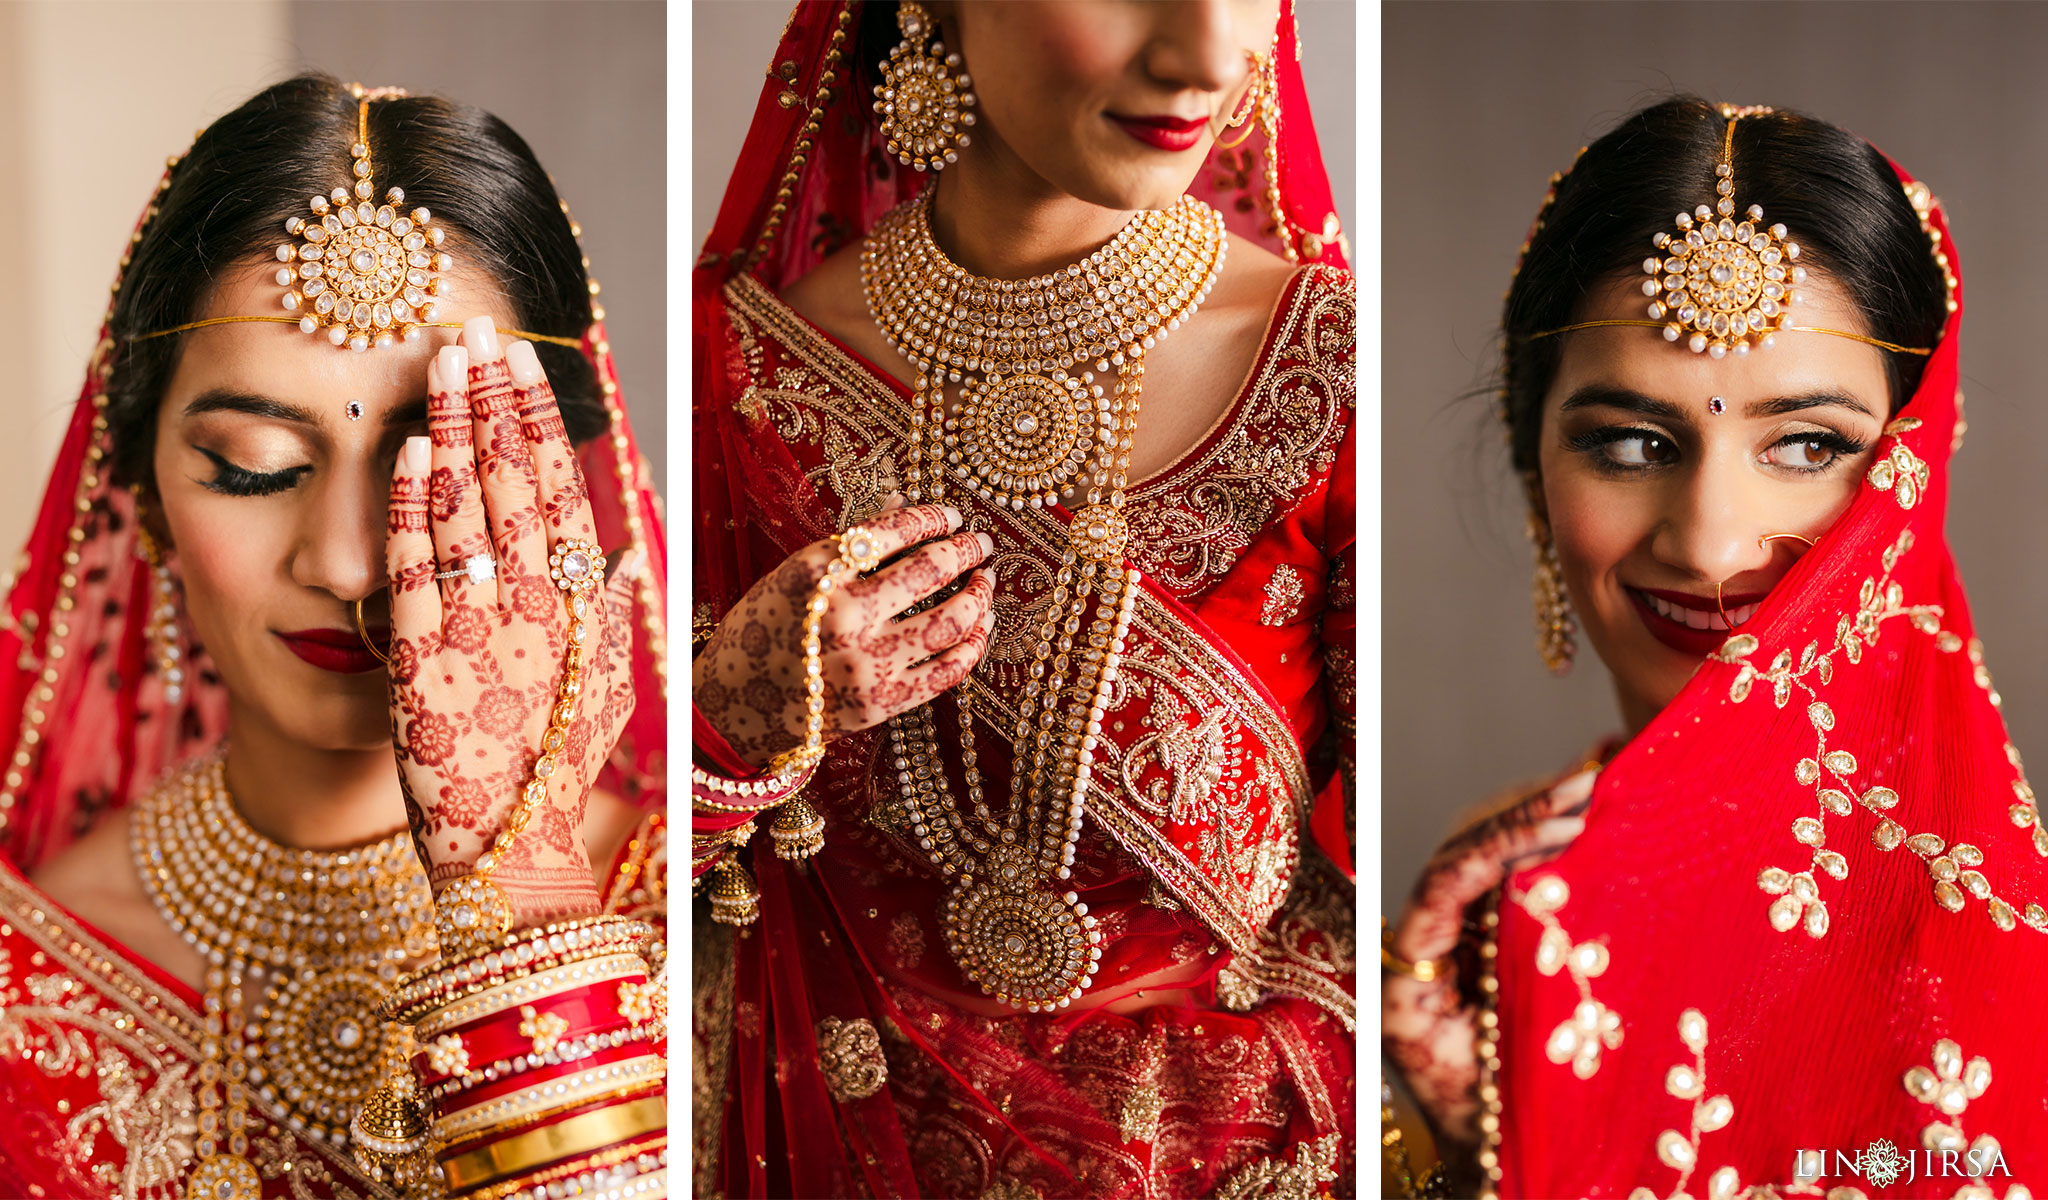 001 san jose marriott indian wedding photography